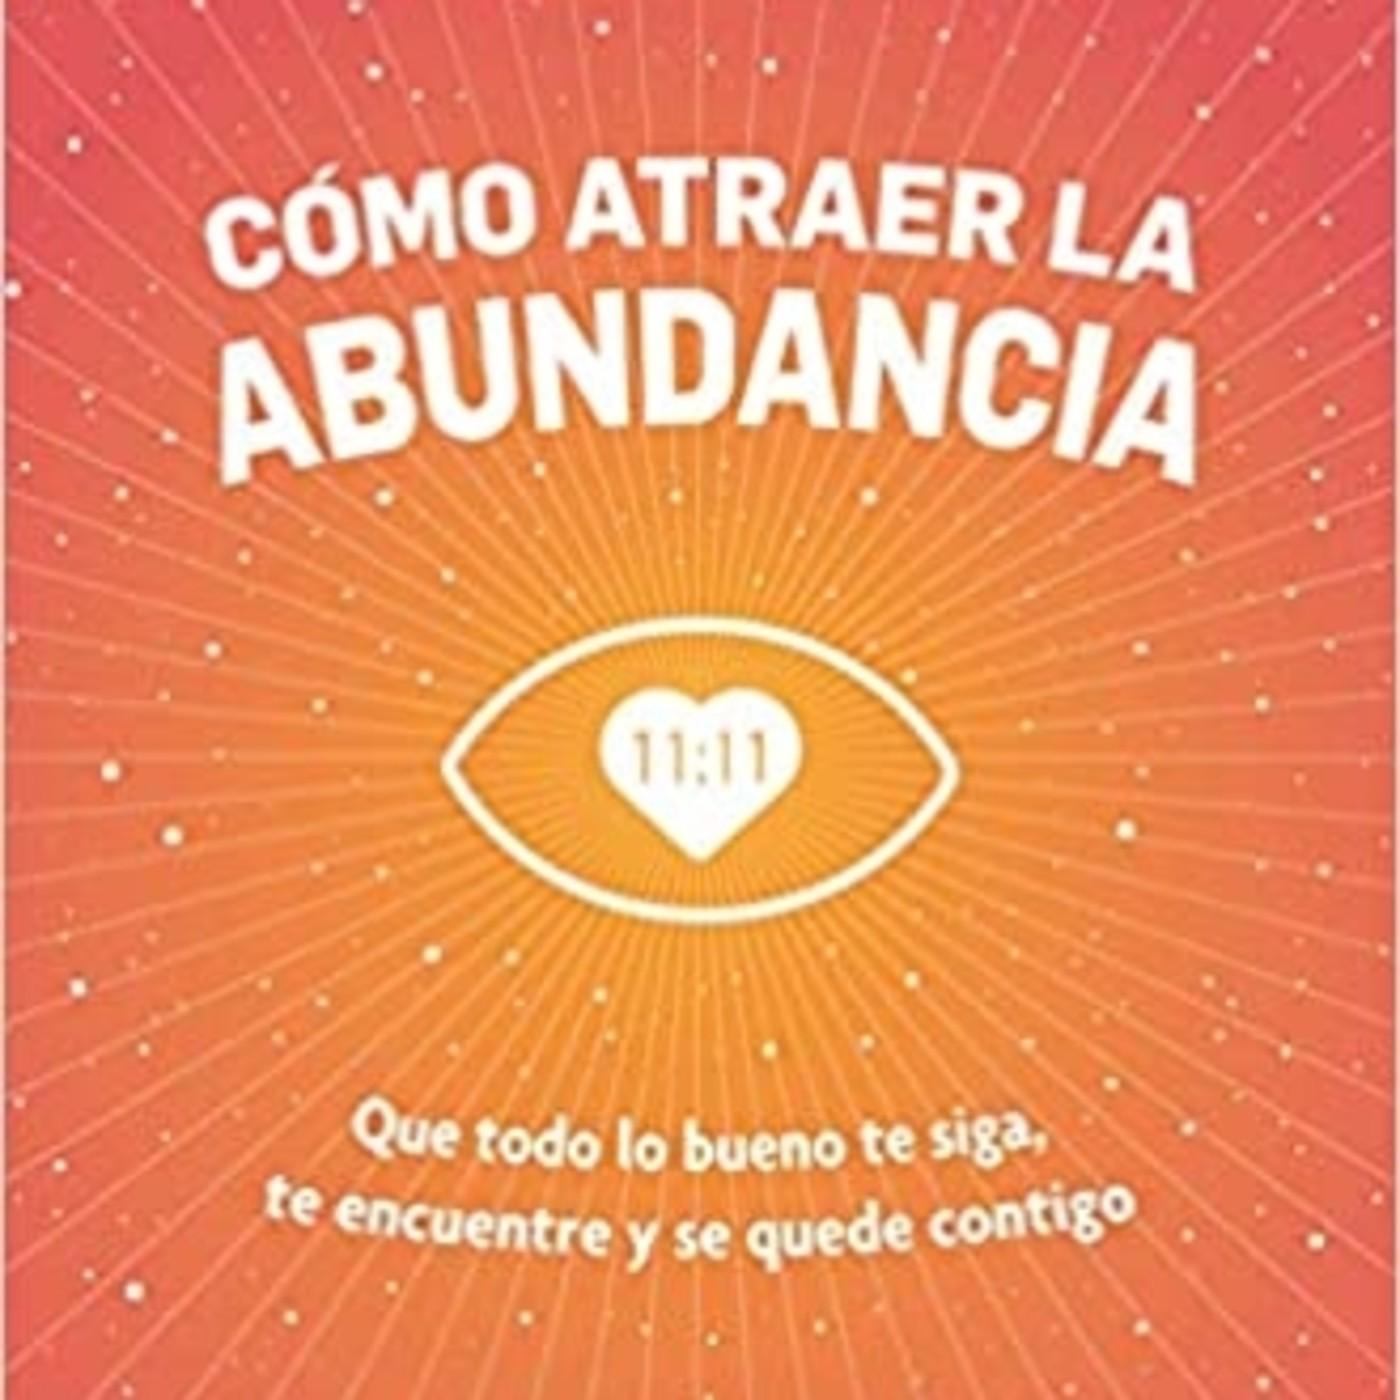 'Como atraer la abundancia' de Claudia Vignatti